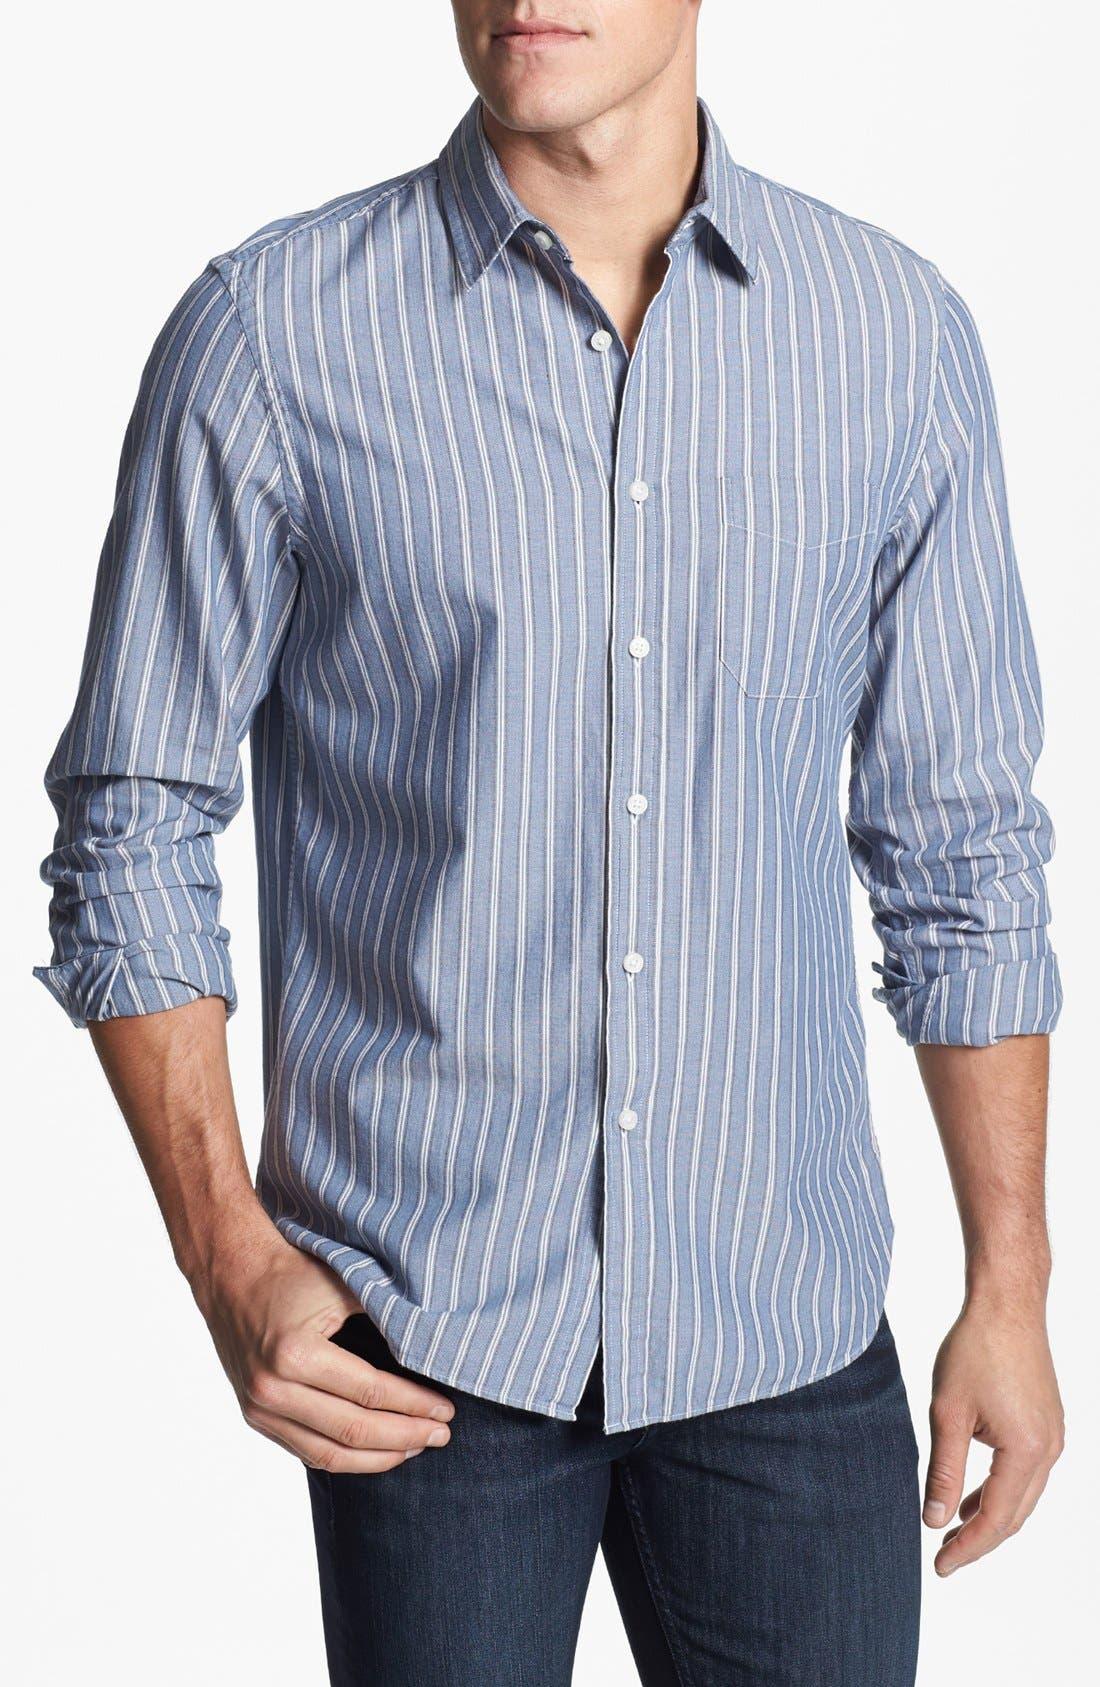 Alternate Image 1 Selected - Wallin & Bros. 'Signature' Trim Fit Sport Shirt